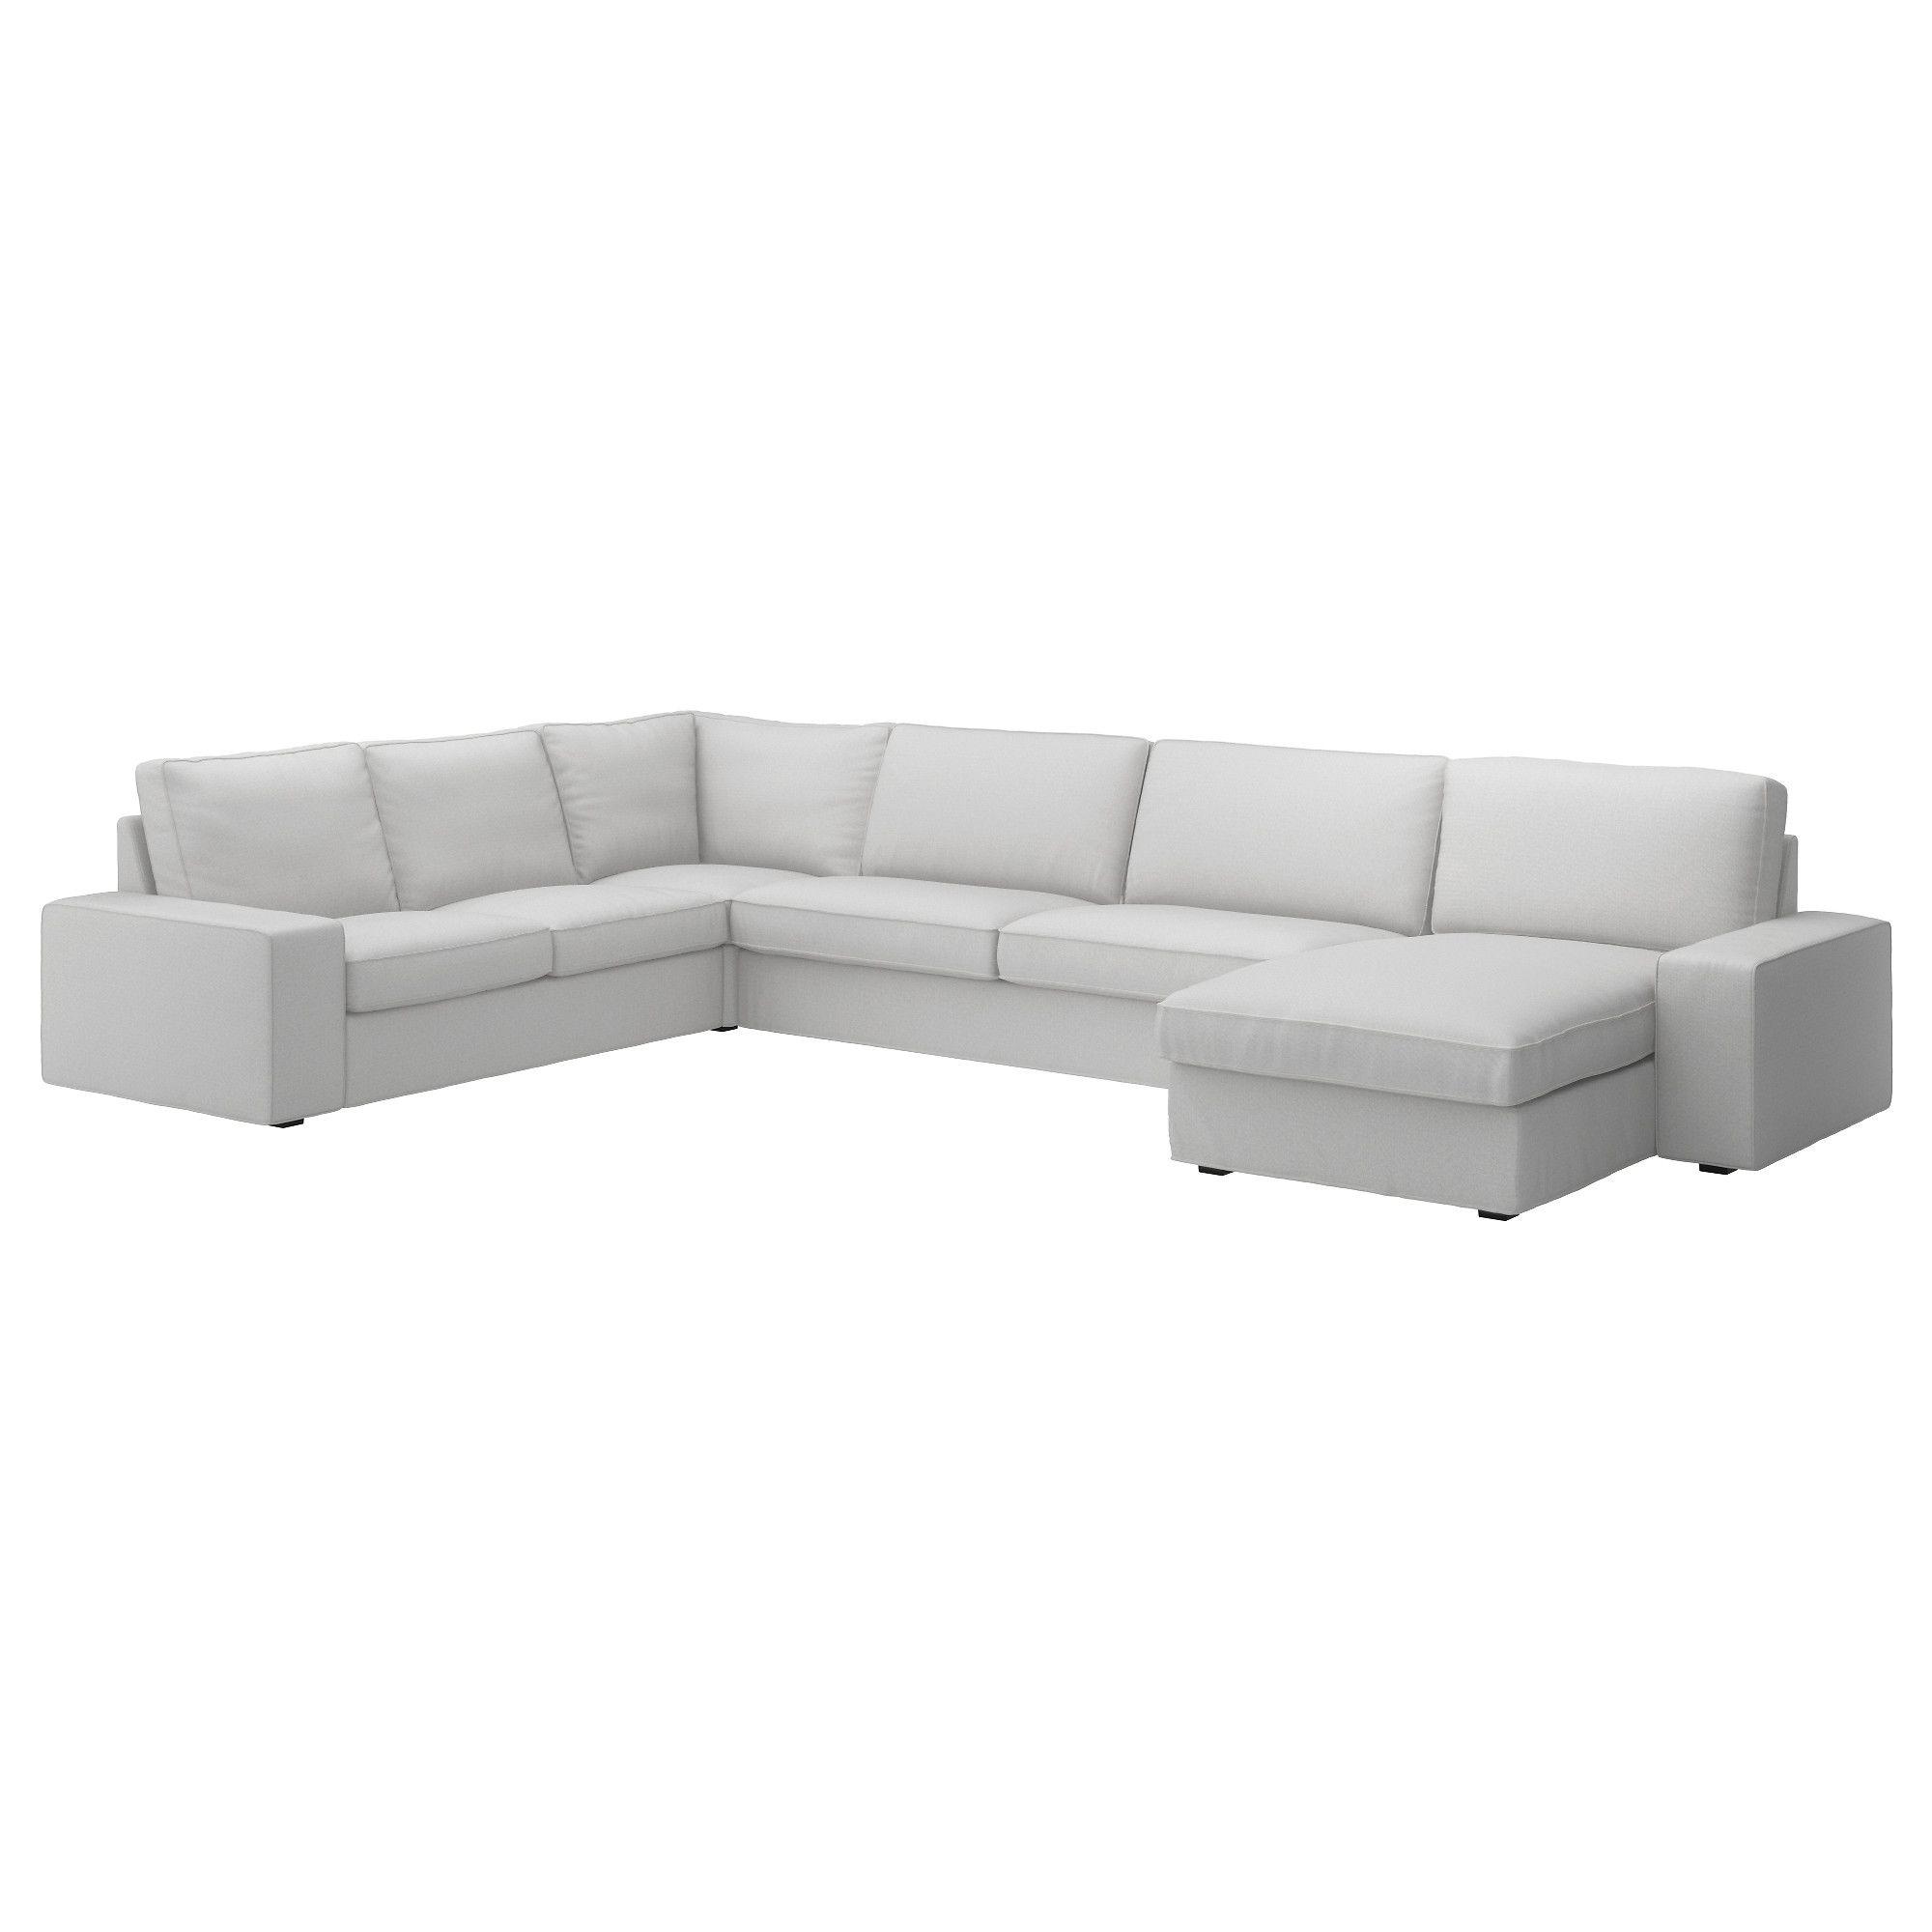 Sectional Sleeper Sofa IKEA KIVIK corner sofa and chaise longue